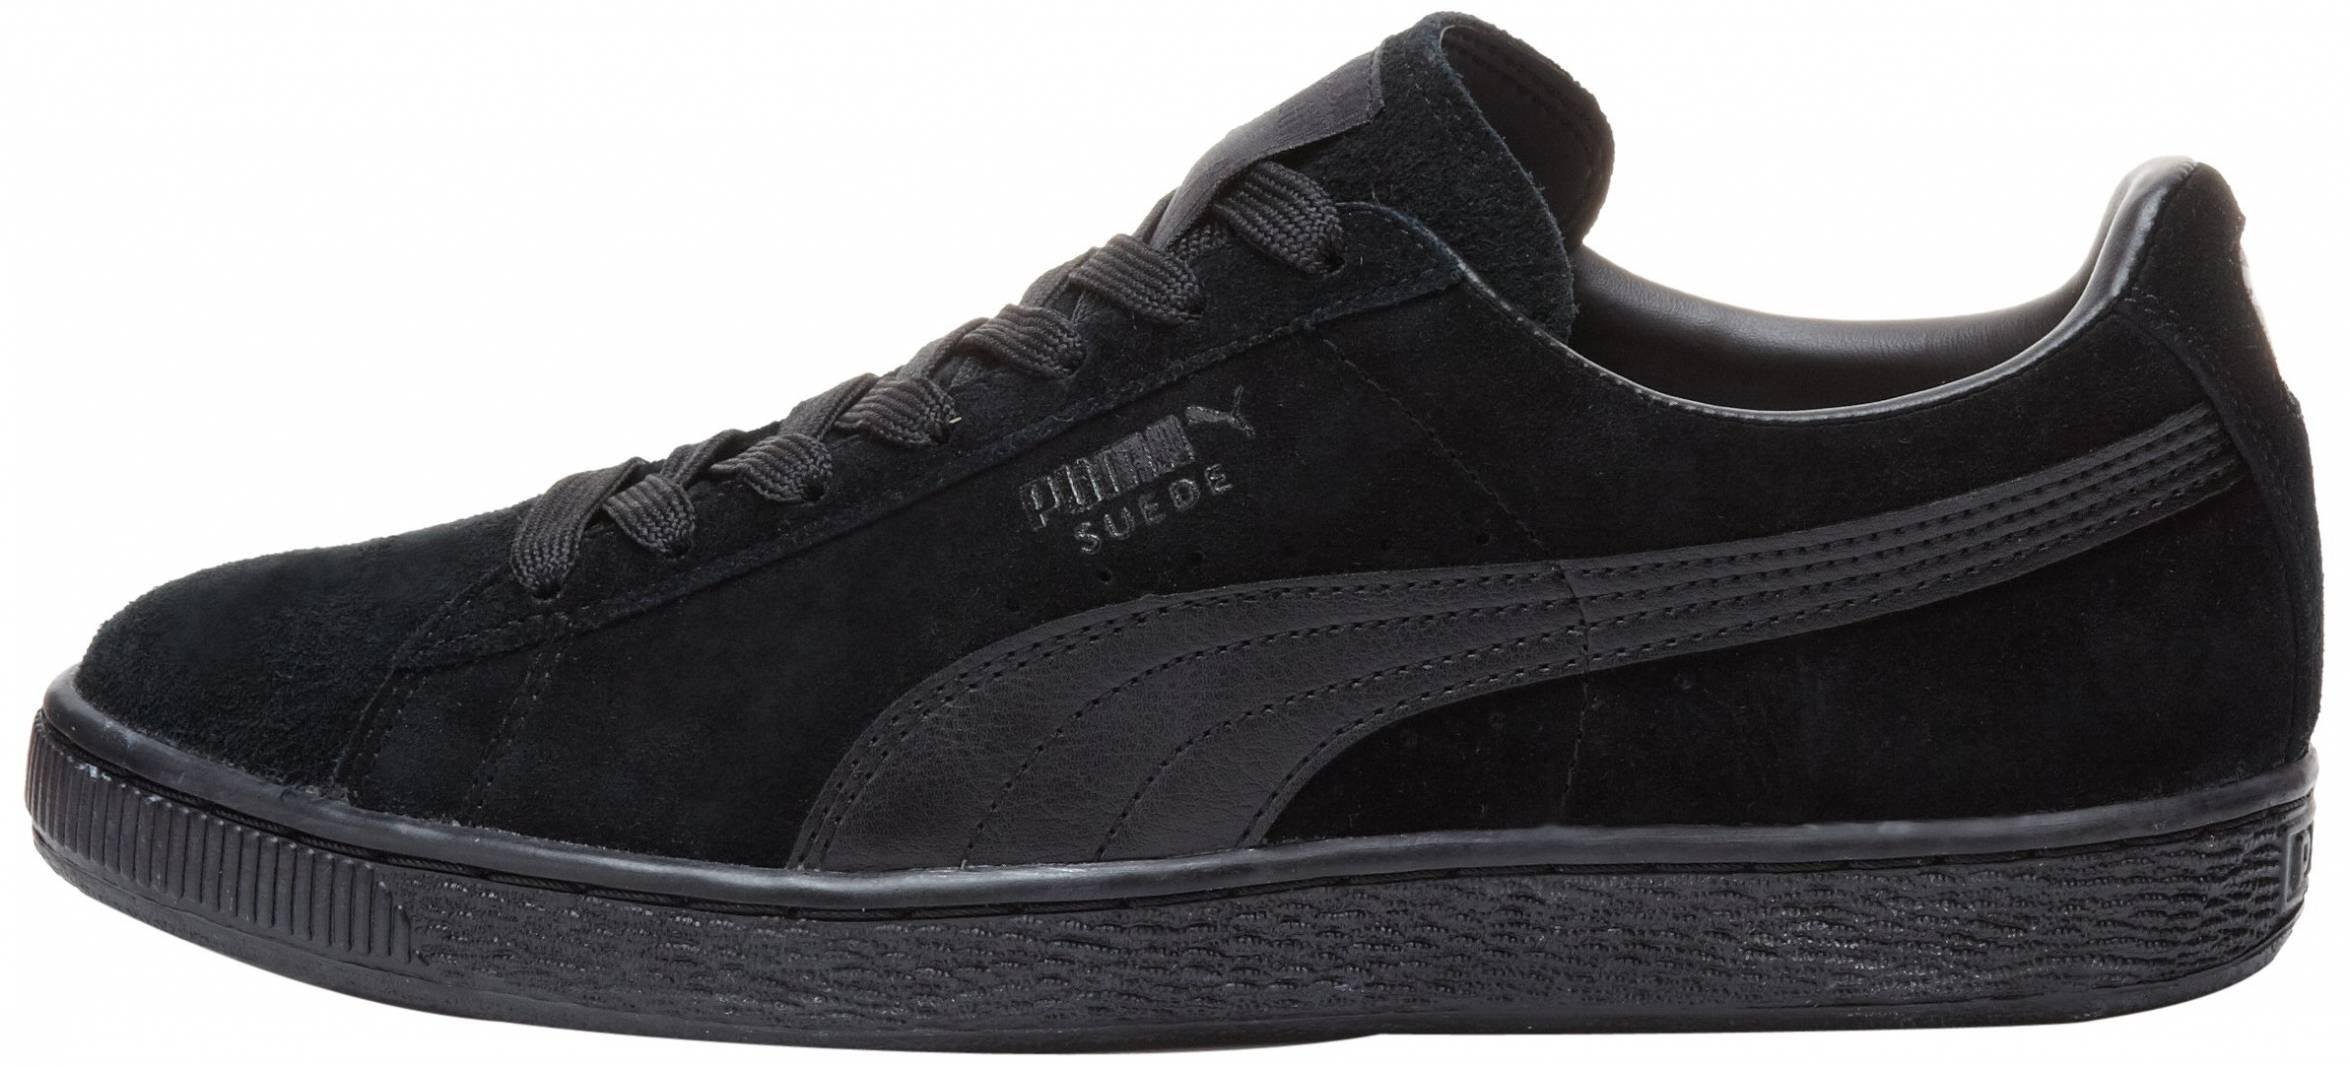 Puma Suede Classic LFS sneakers in black (only $45) | RunRepeat